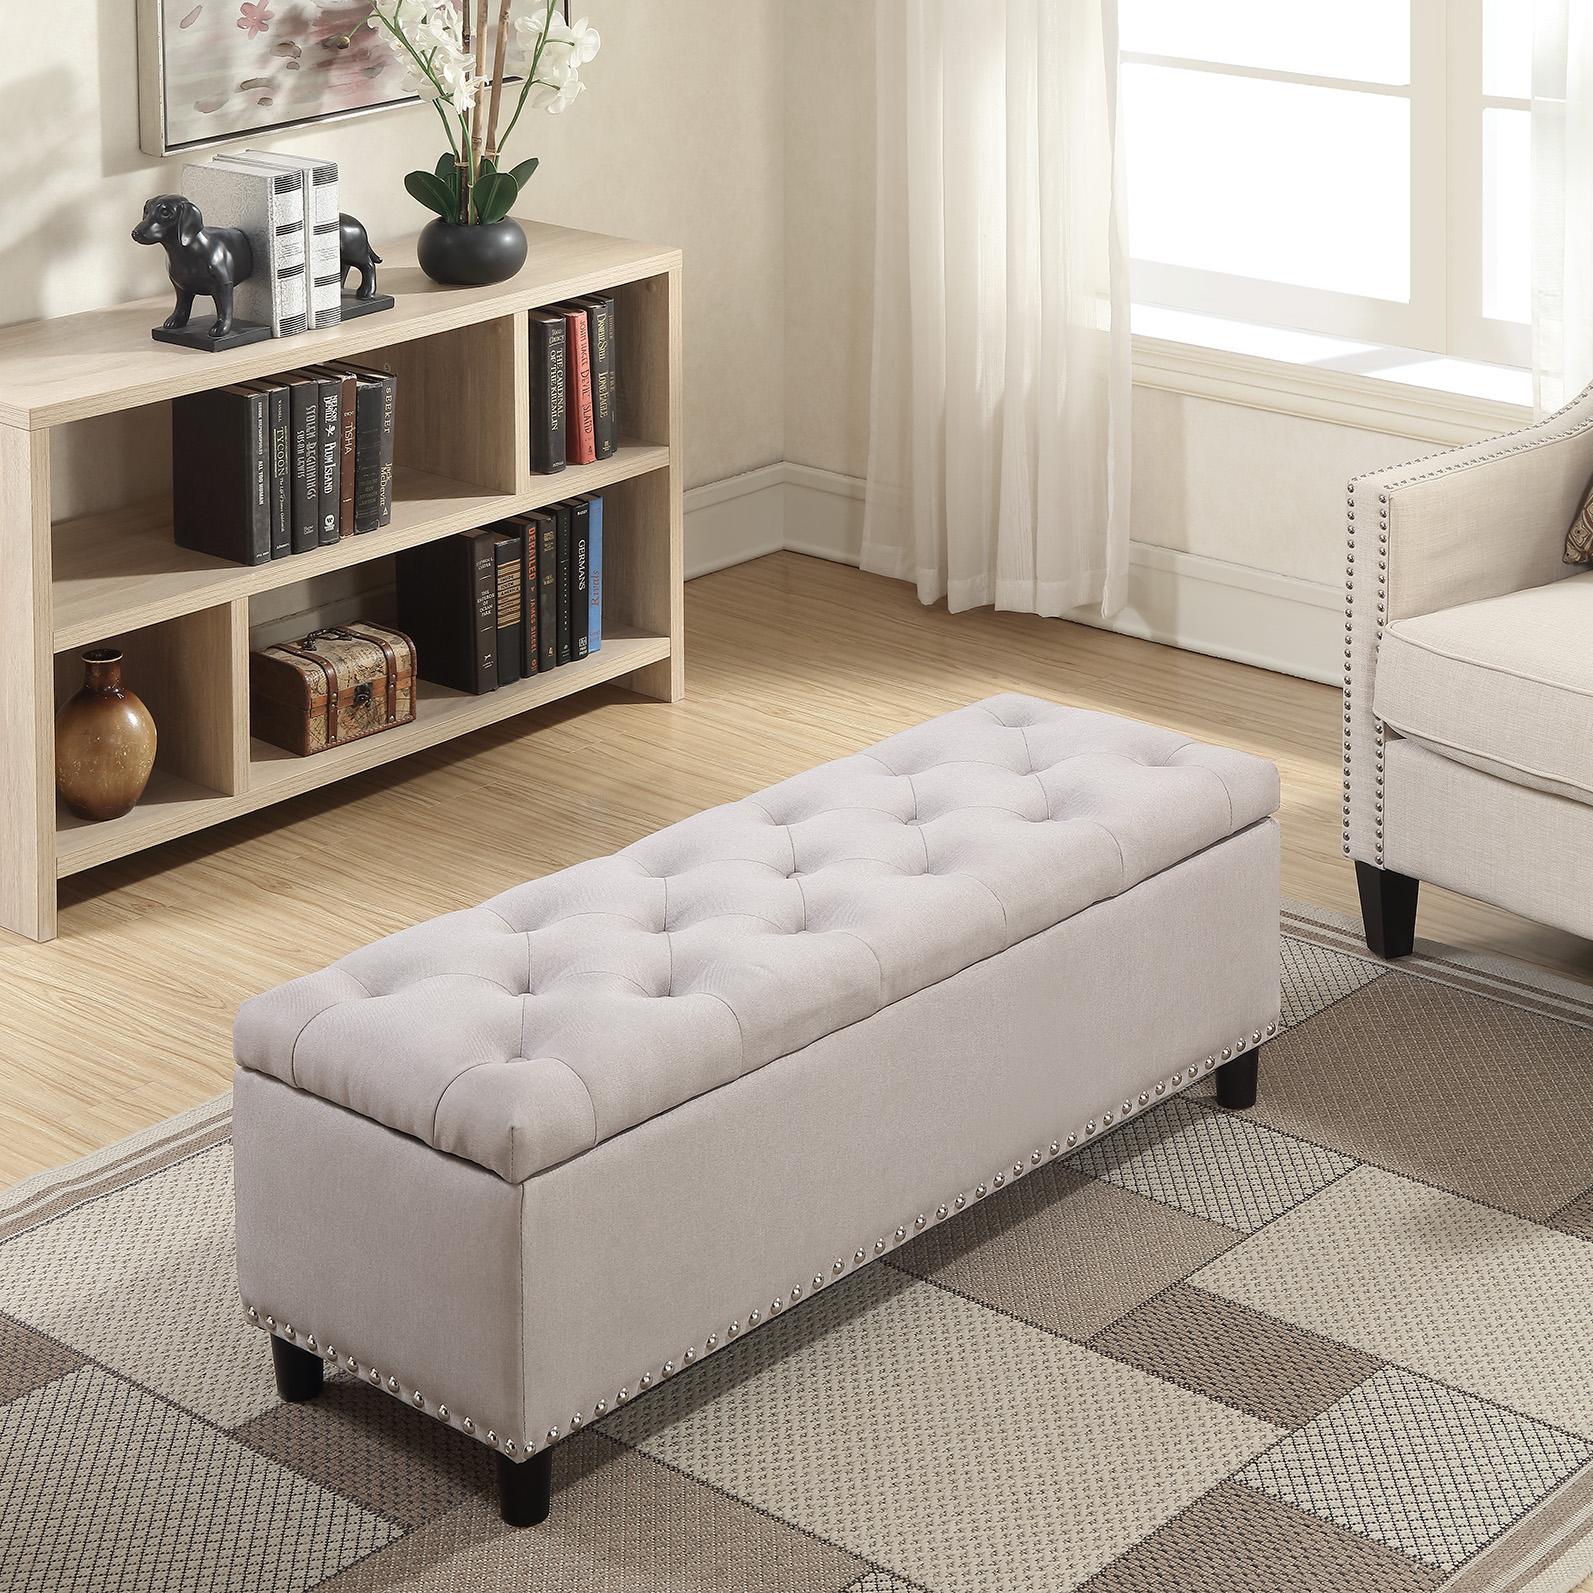 48-034-Faux-Leather-Linen-Storage-Ottoman-Footrest-Bench-Lift-Top thumbnail 17